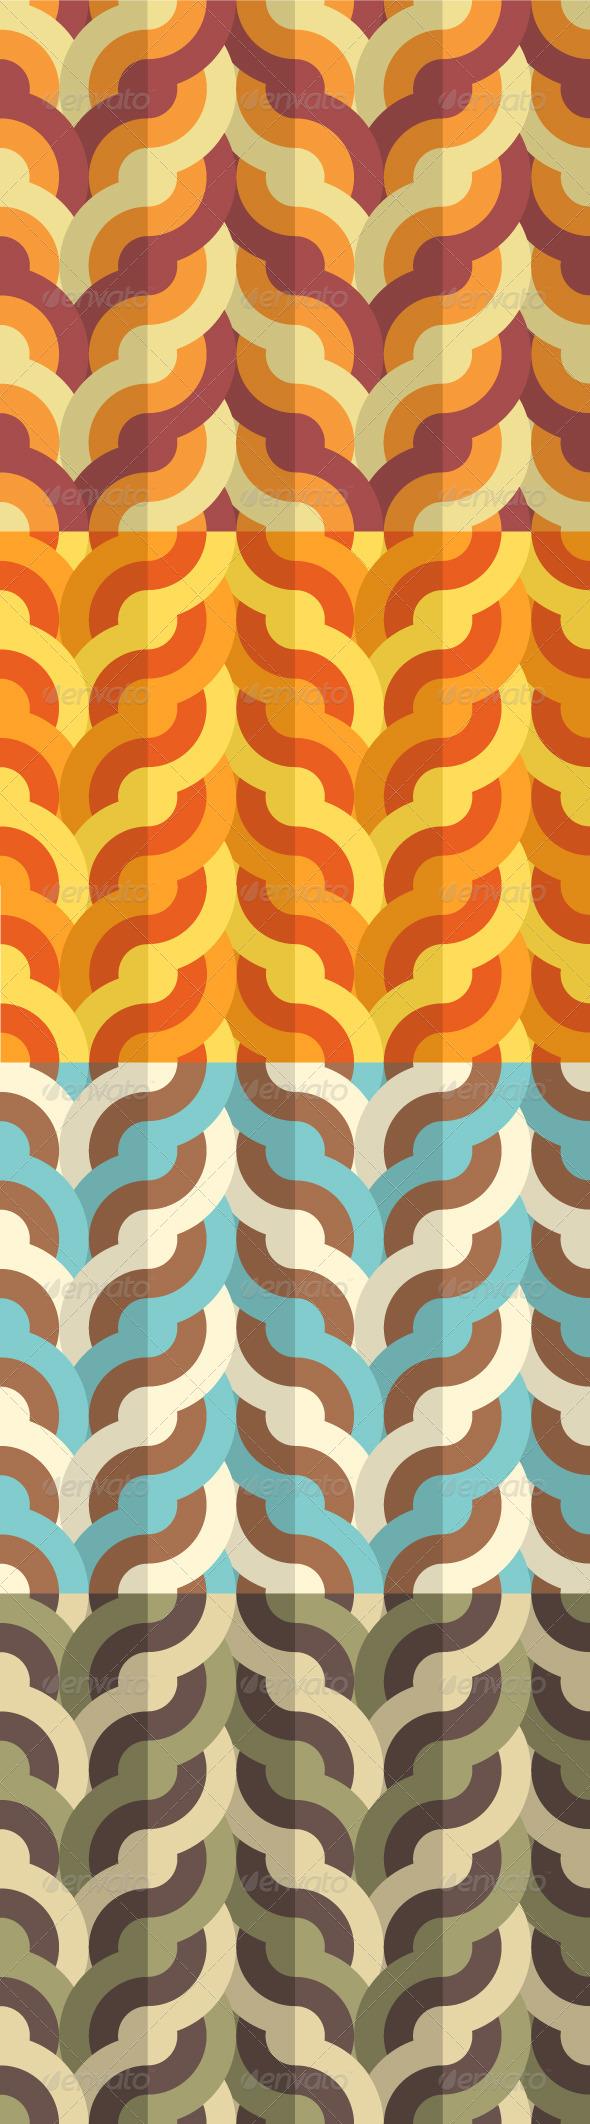 GraphicRiver Flat Geometric Weaving Pattern 5605948